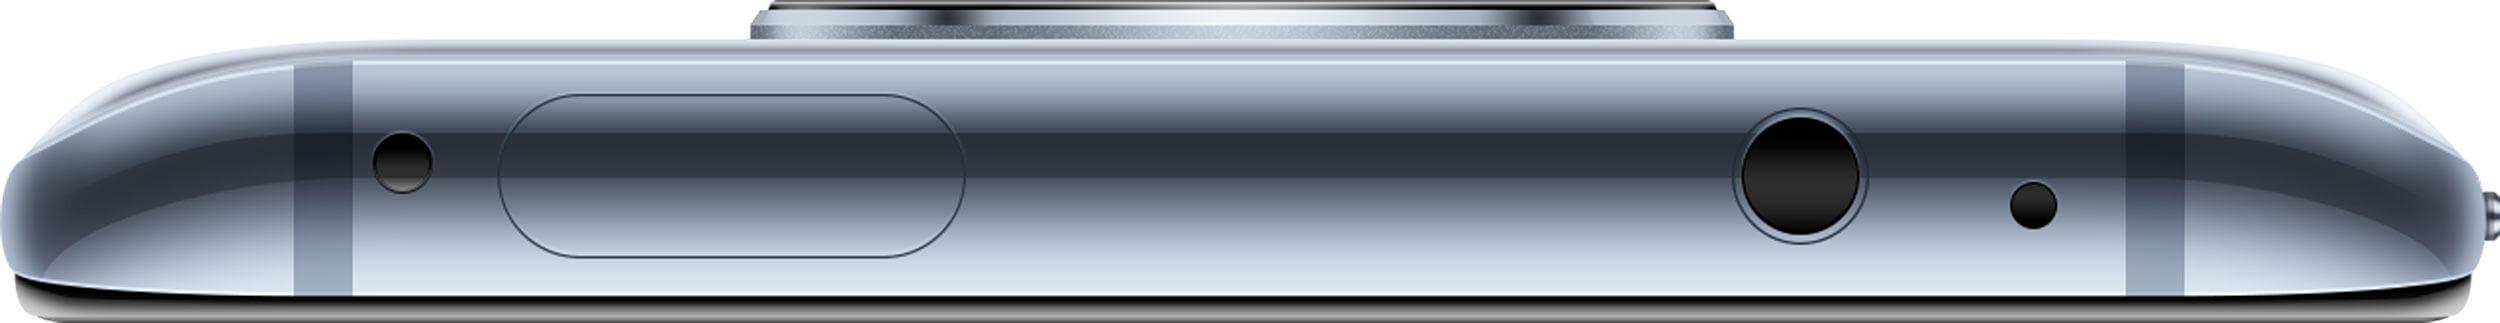 Smartphone POCO F2 Pro - 6+128GB - Gri